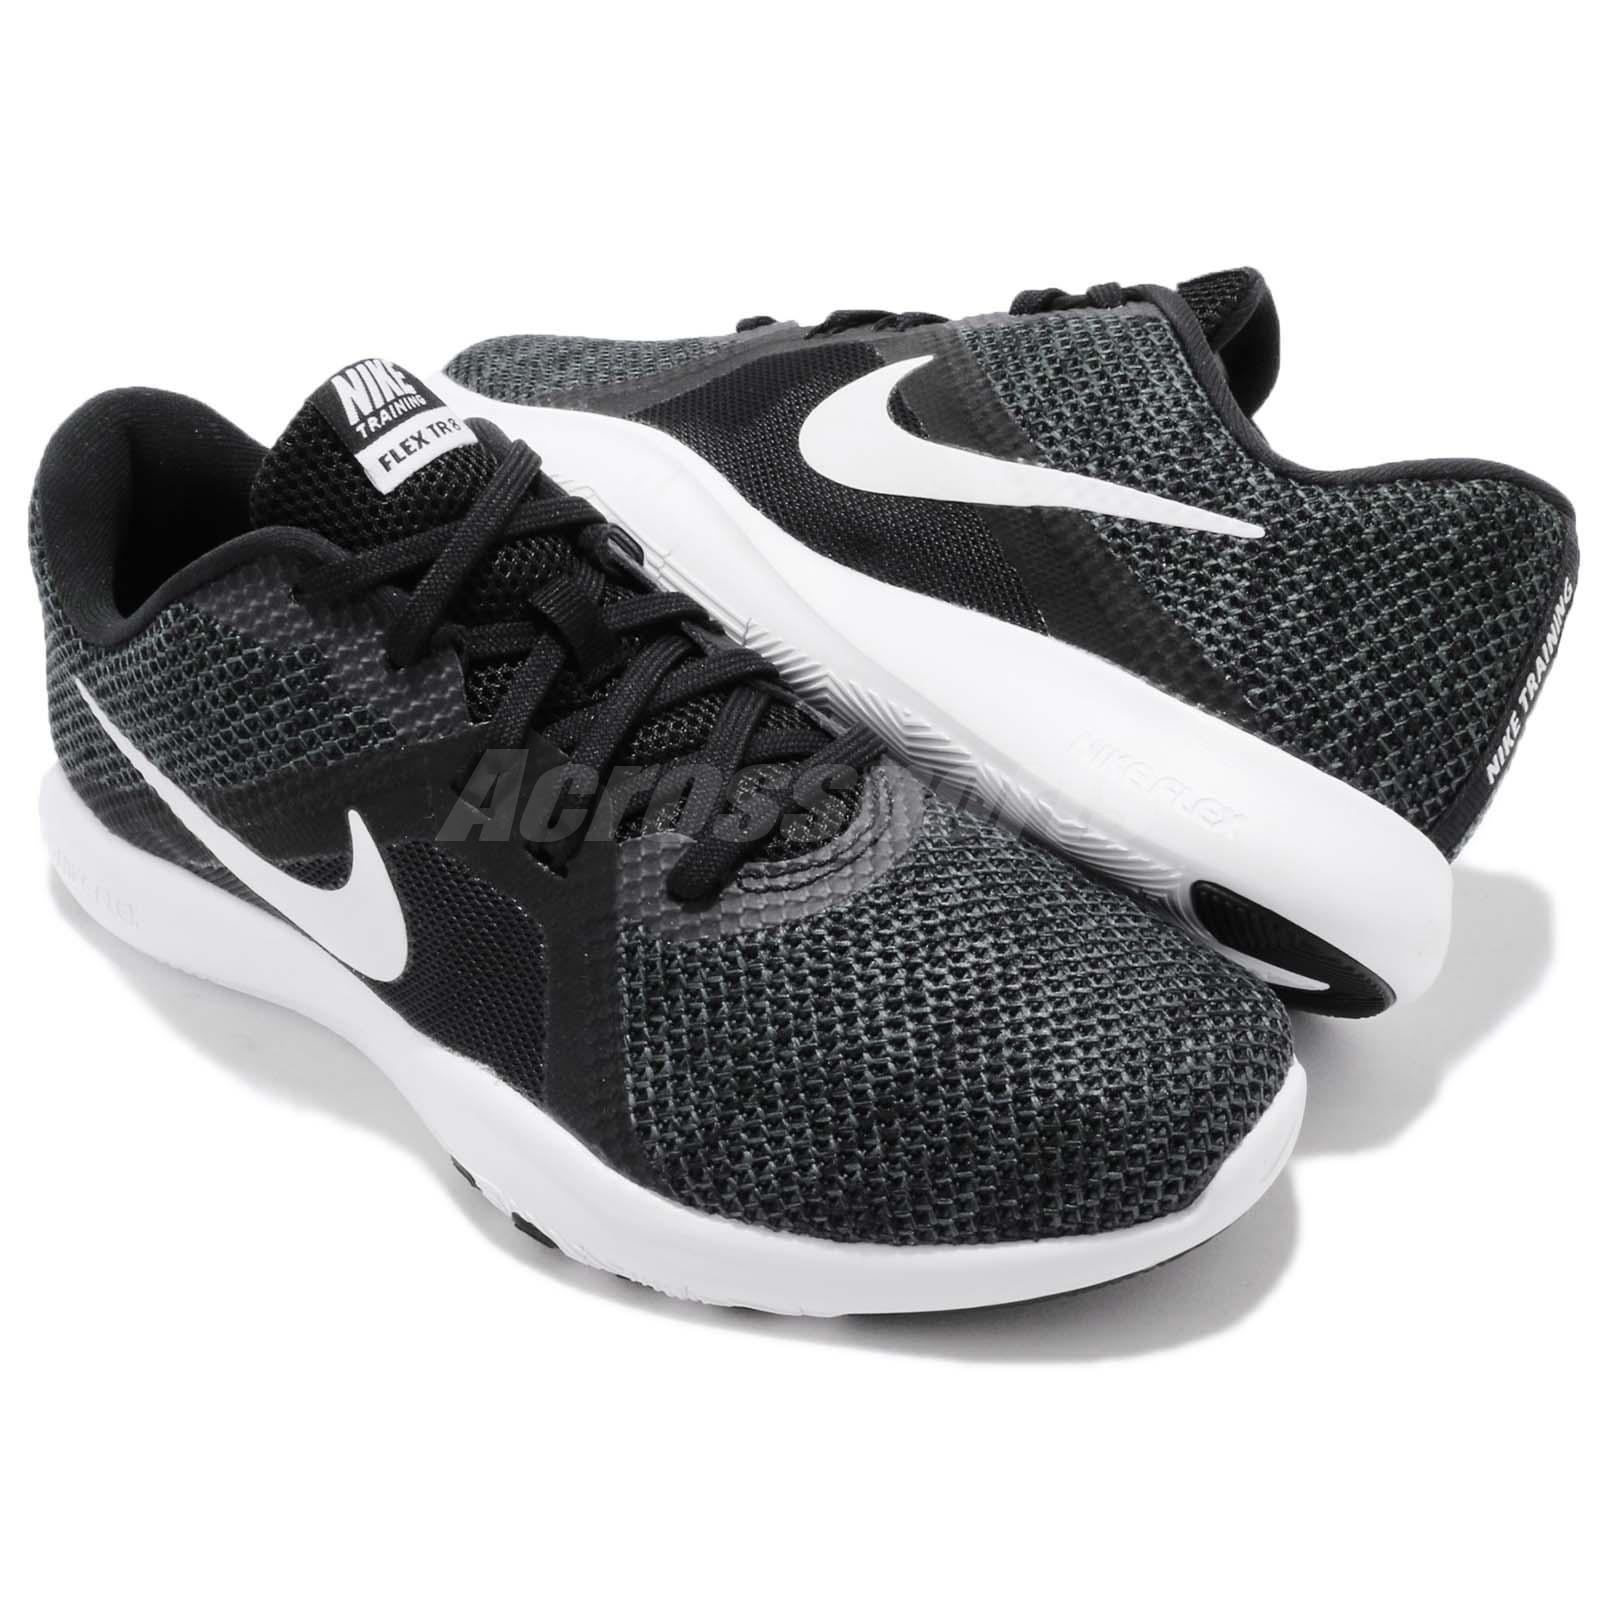 brand new 23a27 8a7ee Wmns Nike Flex Trainer 8 VIII Black White Women Cross Training Shoes ...